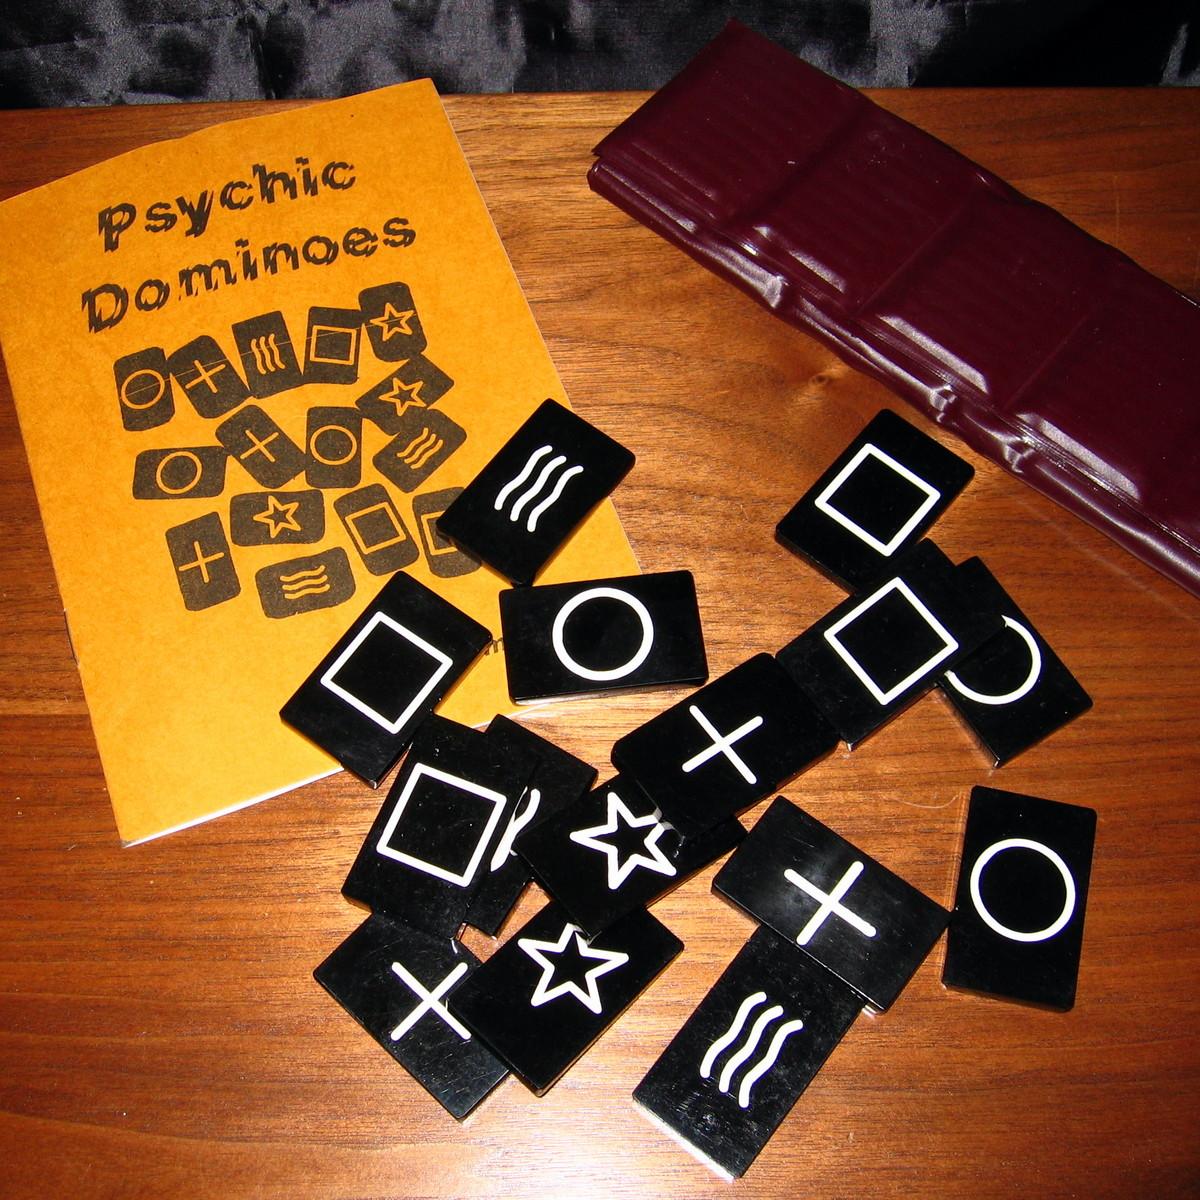 Psychic Dominos